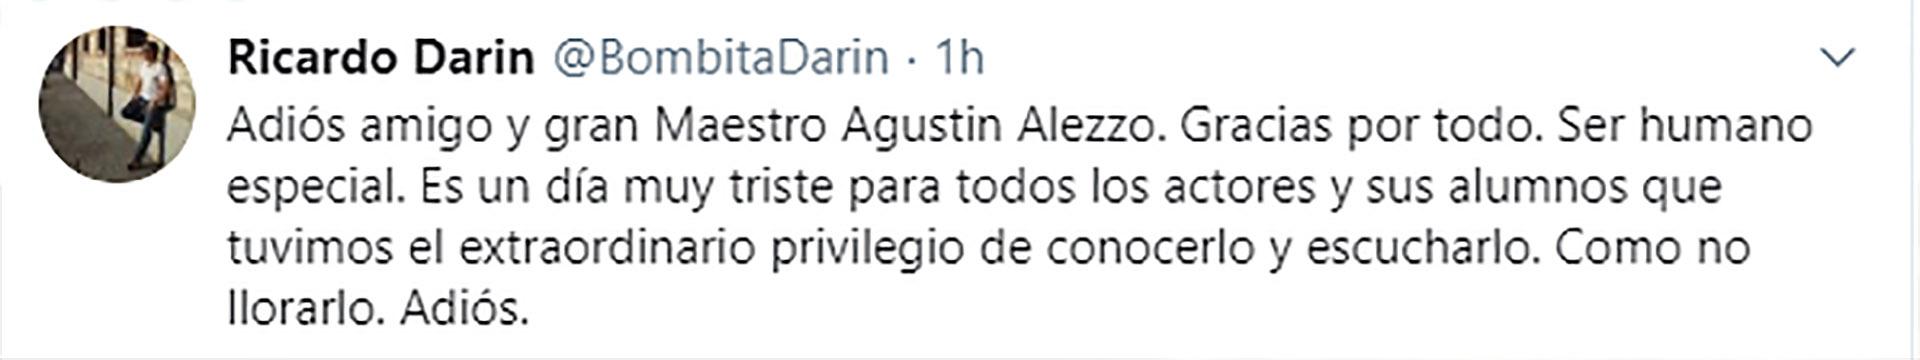 El tuit de Ricardo Darín